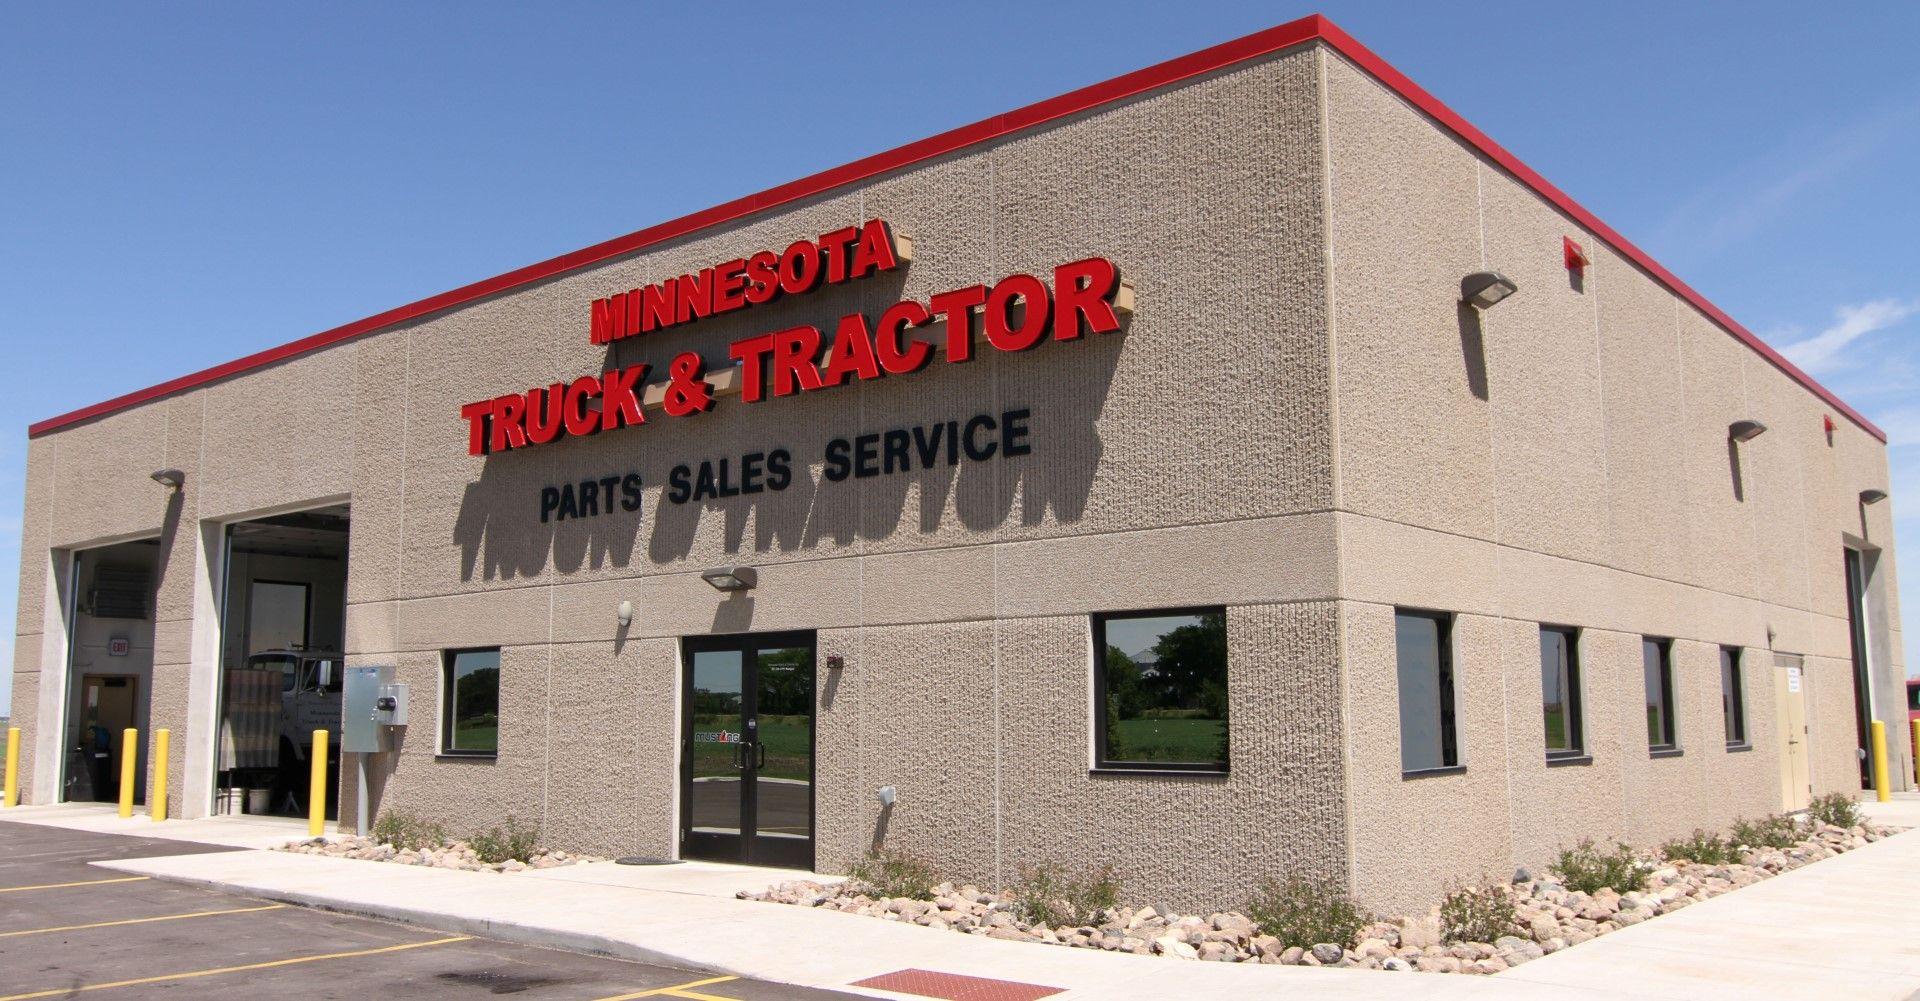 Car Dealerships In Grand Forks Nd >> Precast; Concrete; Car Dealerships: Minnesota Truck and ...